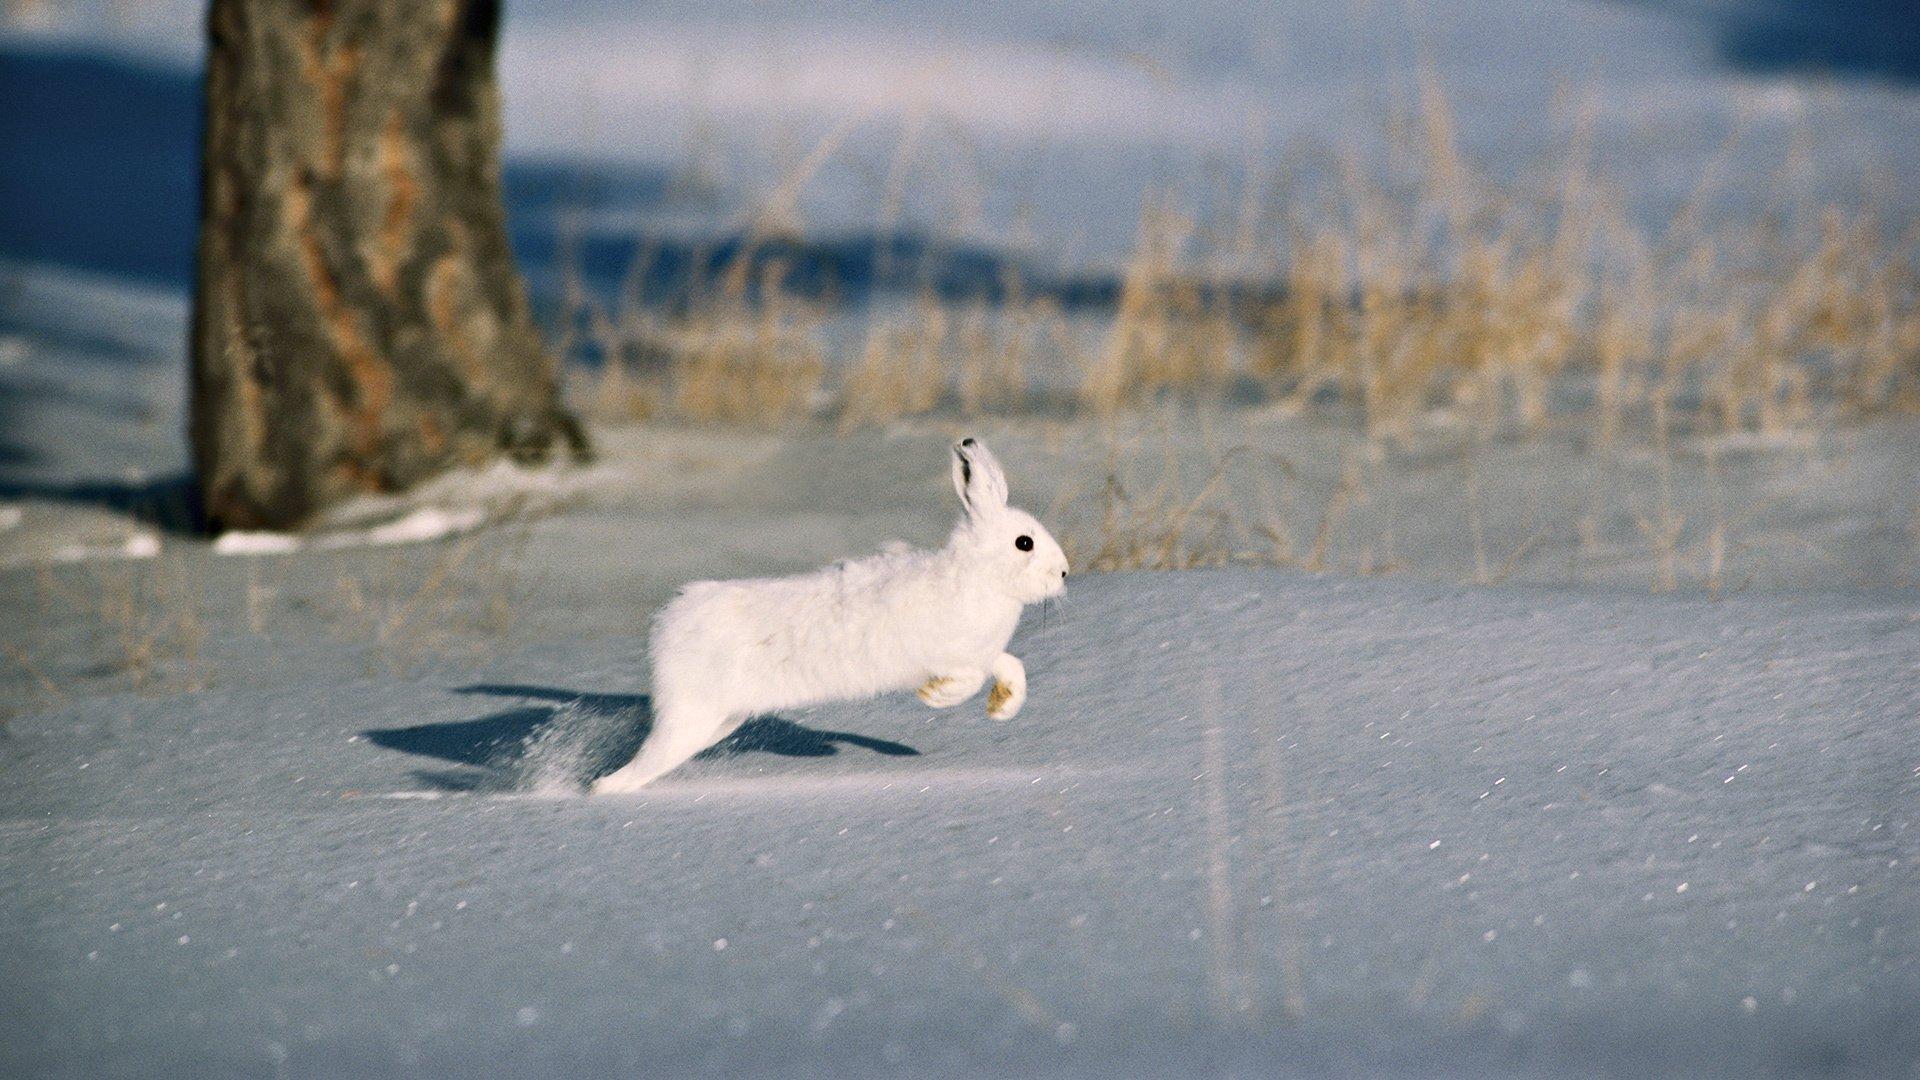 ARCTIC HARE rabbit rabbit wallpaper | 1920x1080 | 467032 ...